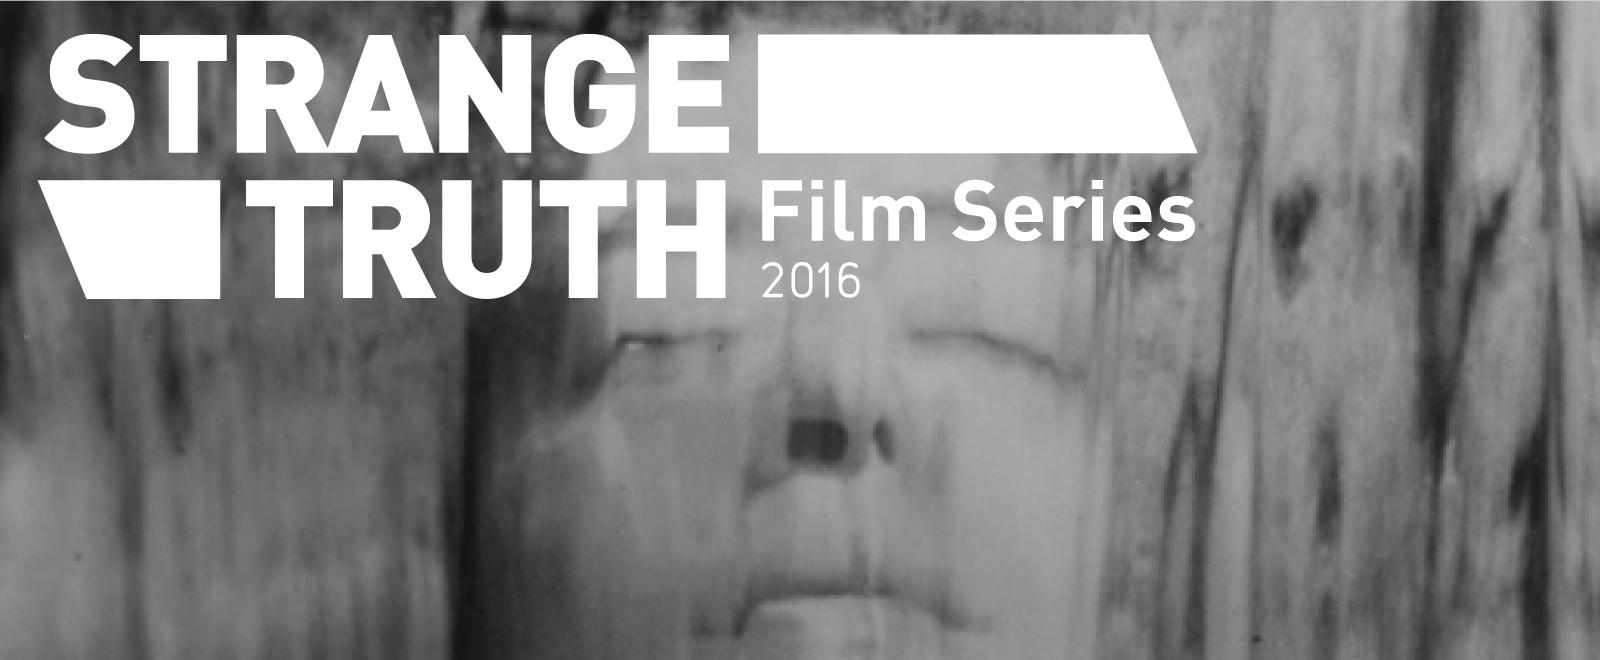 STRANGE TRUTH documentary film series